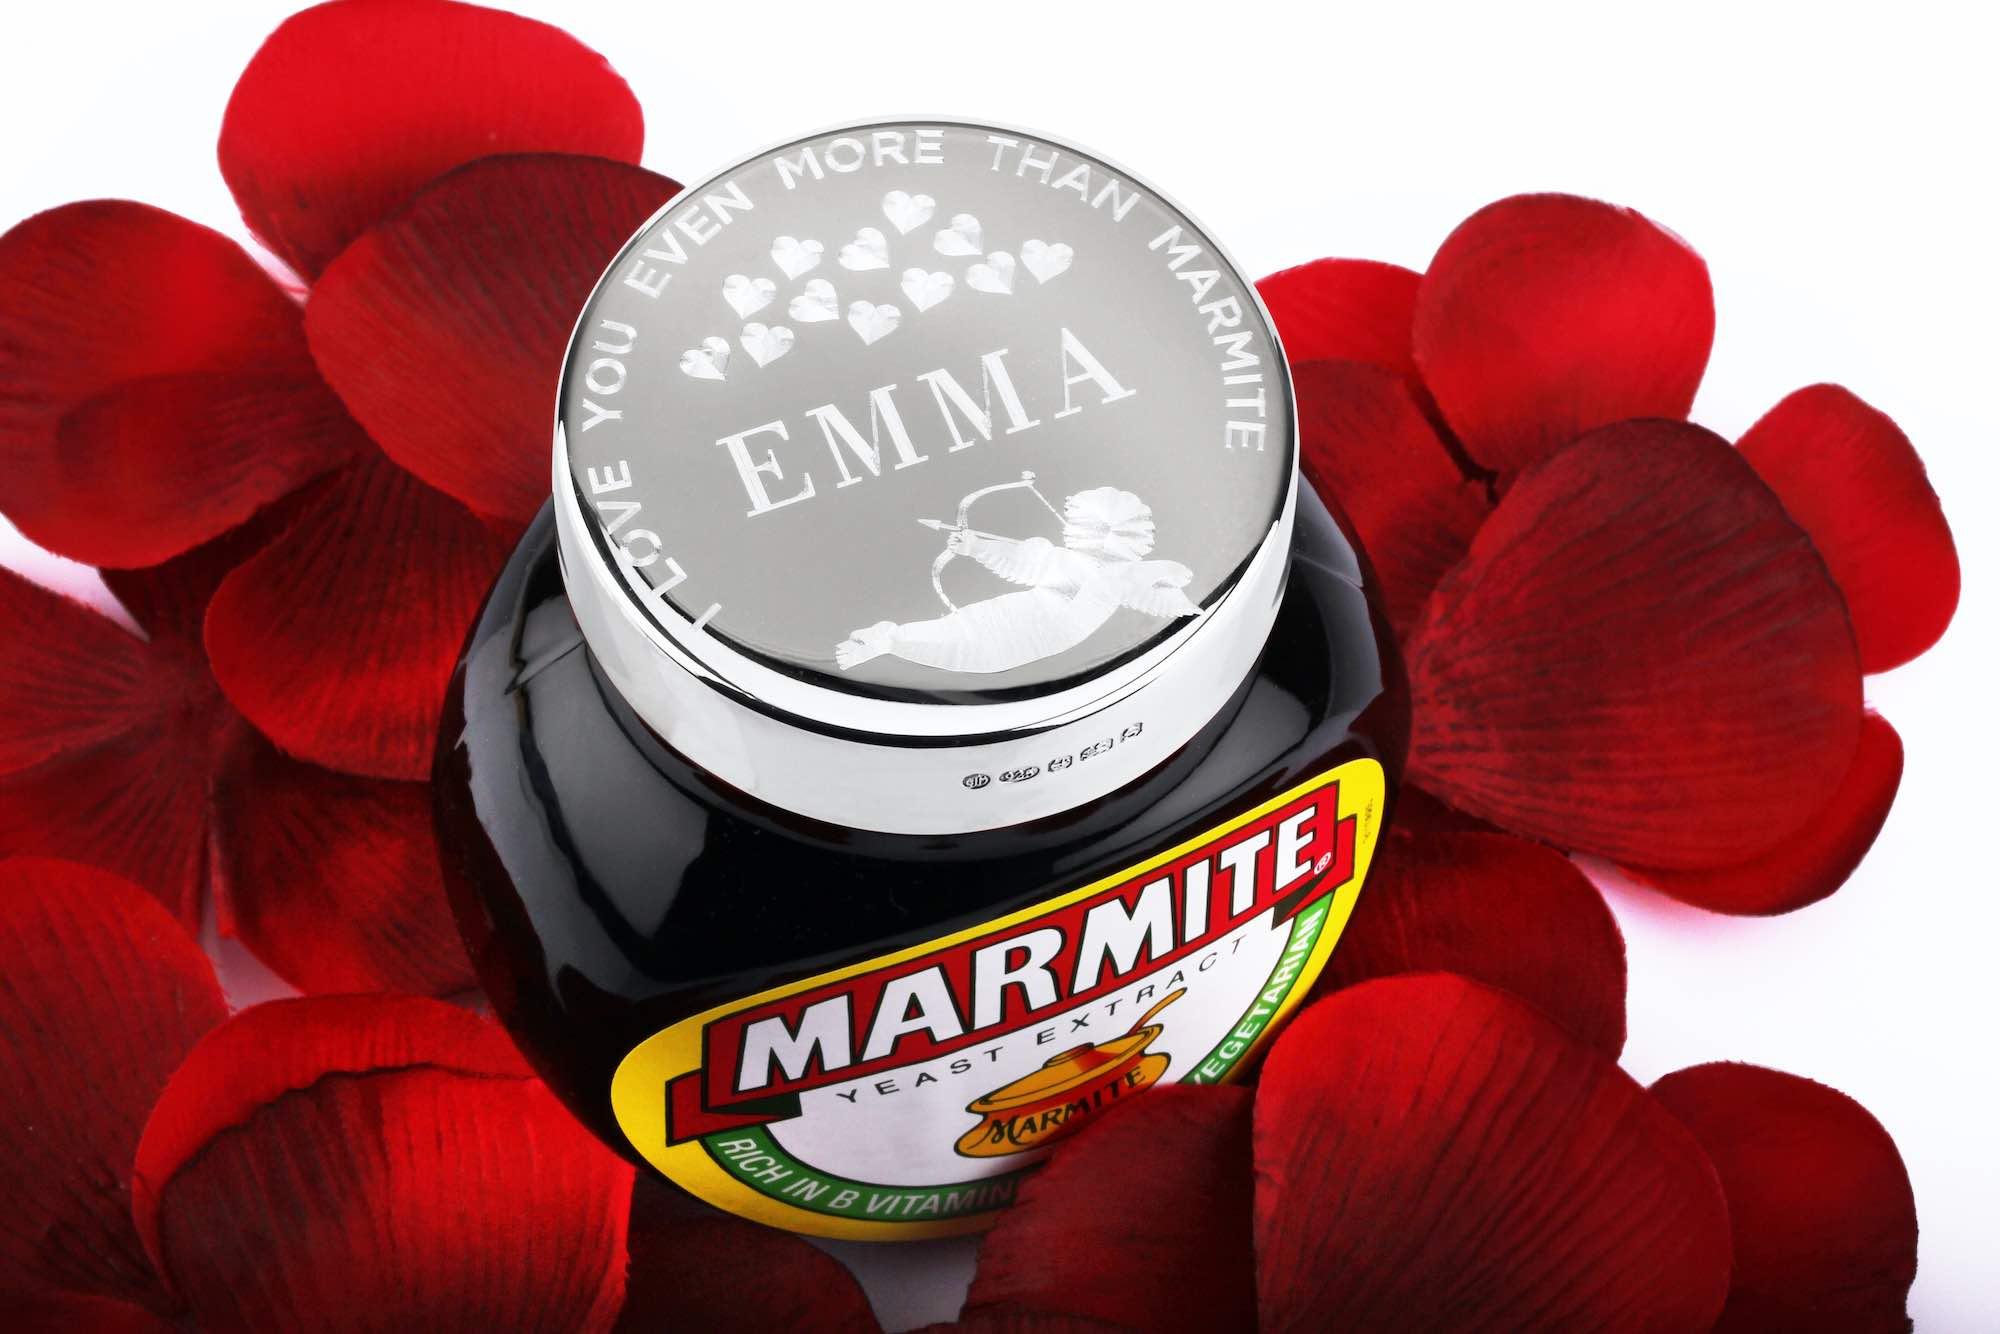 Valentines Edition Marmite Jar Launched